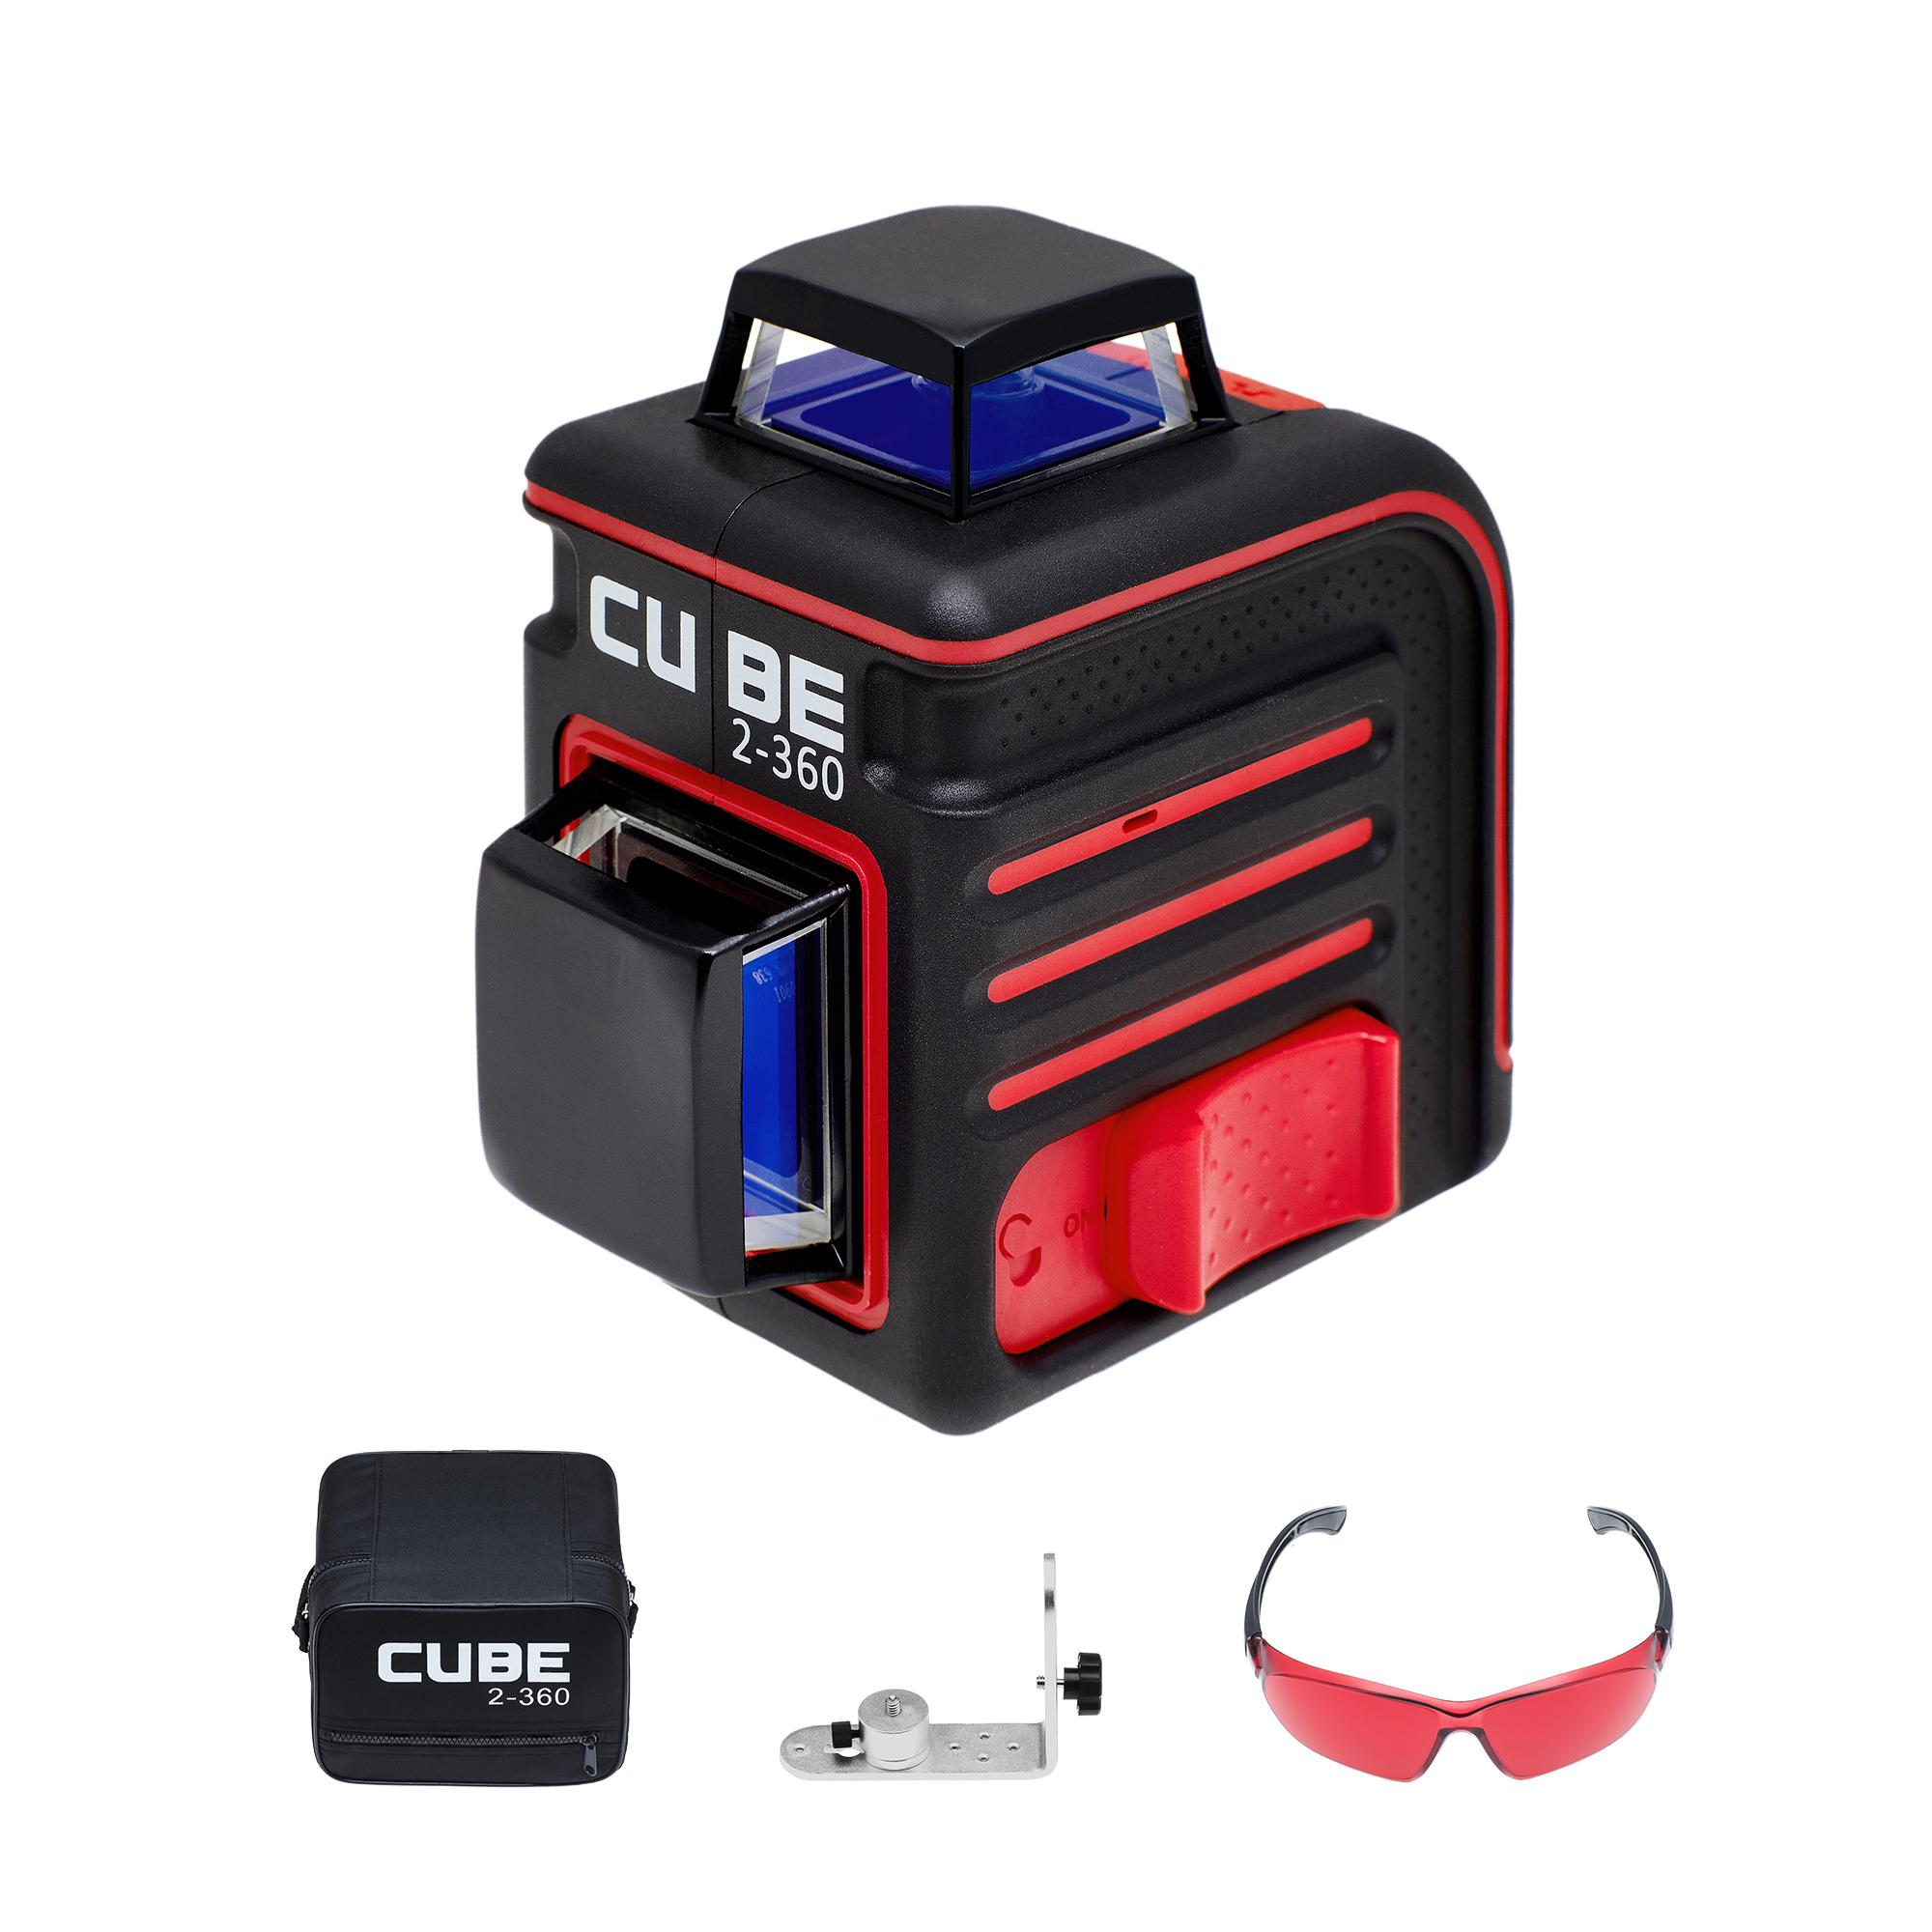 Фото 1/2 Cube 2-360 home edition, Уровень